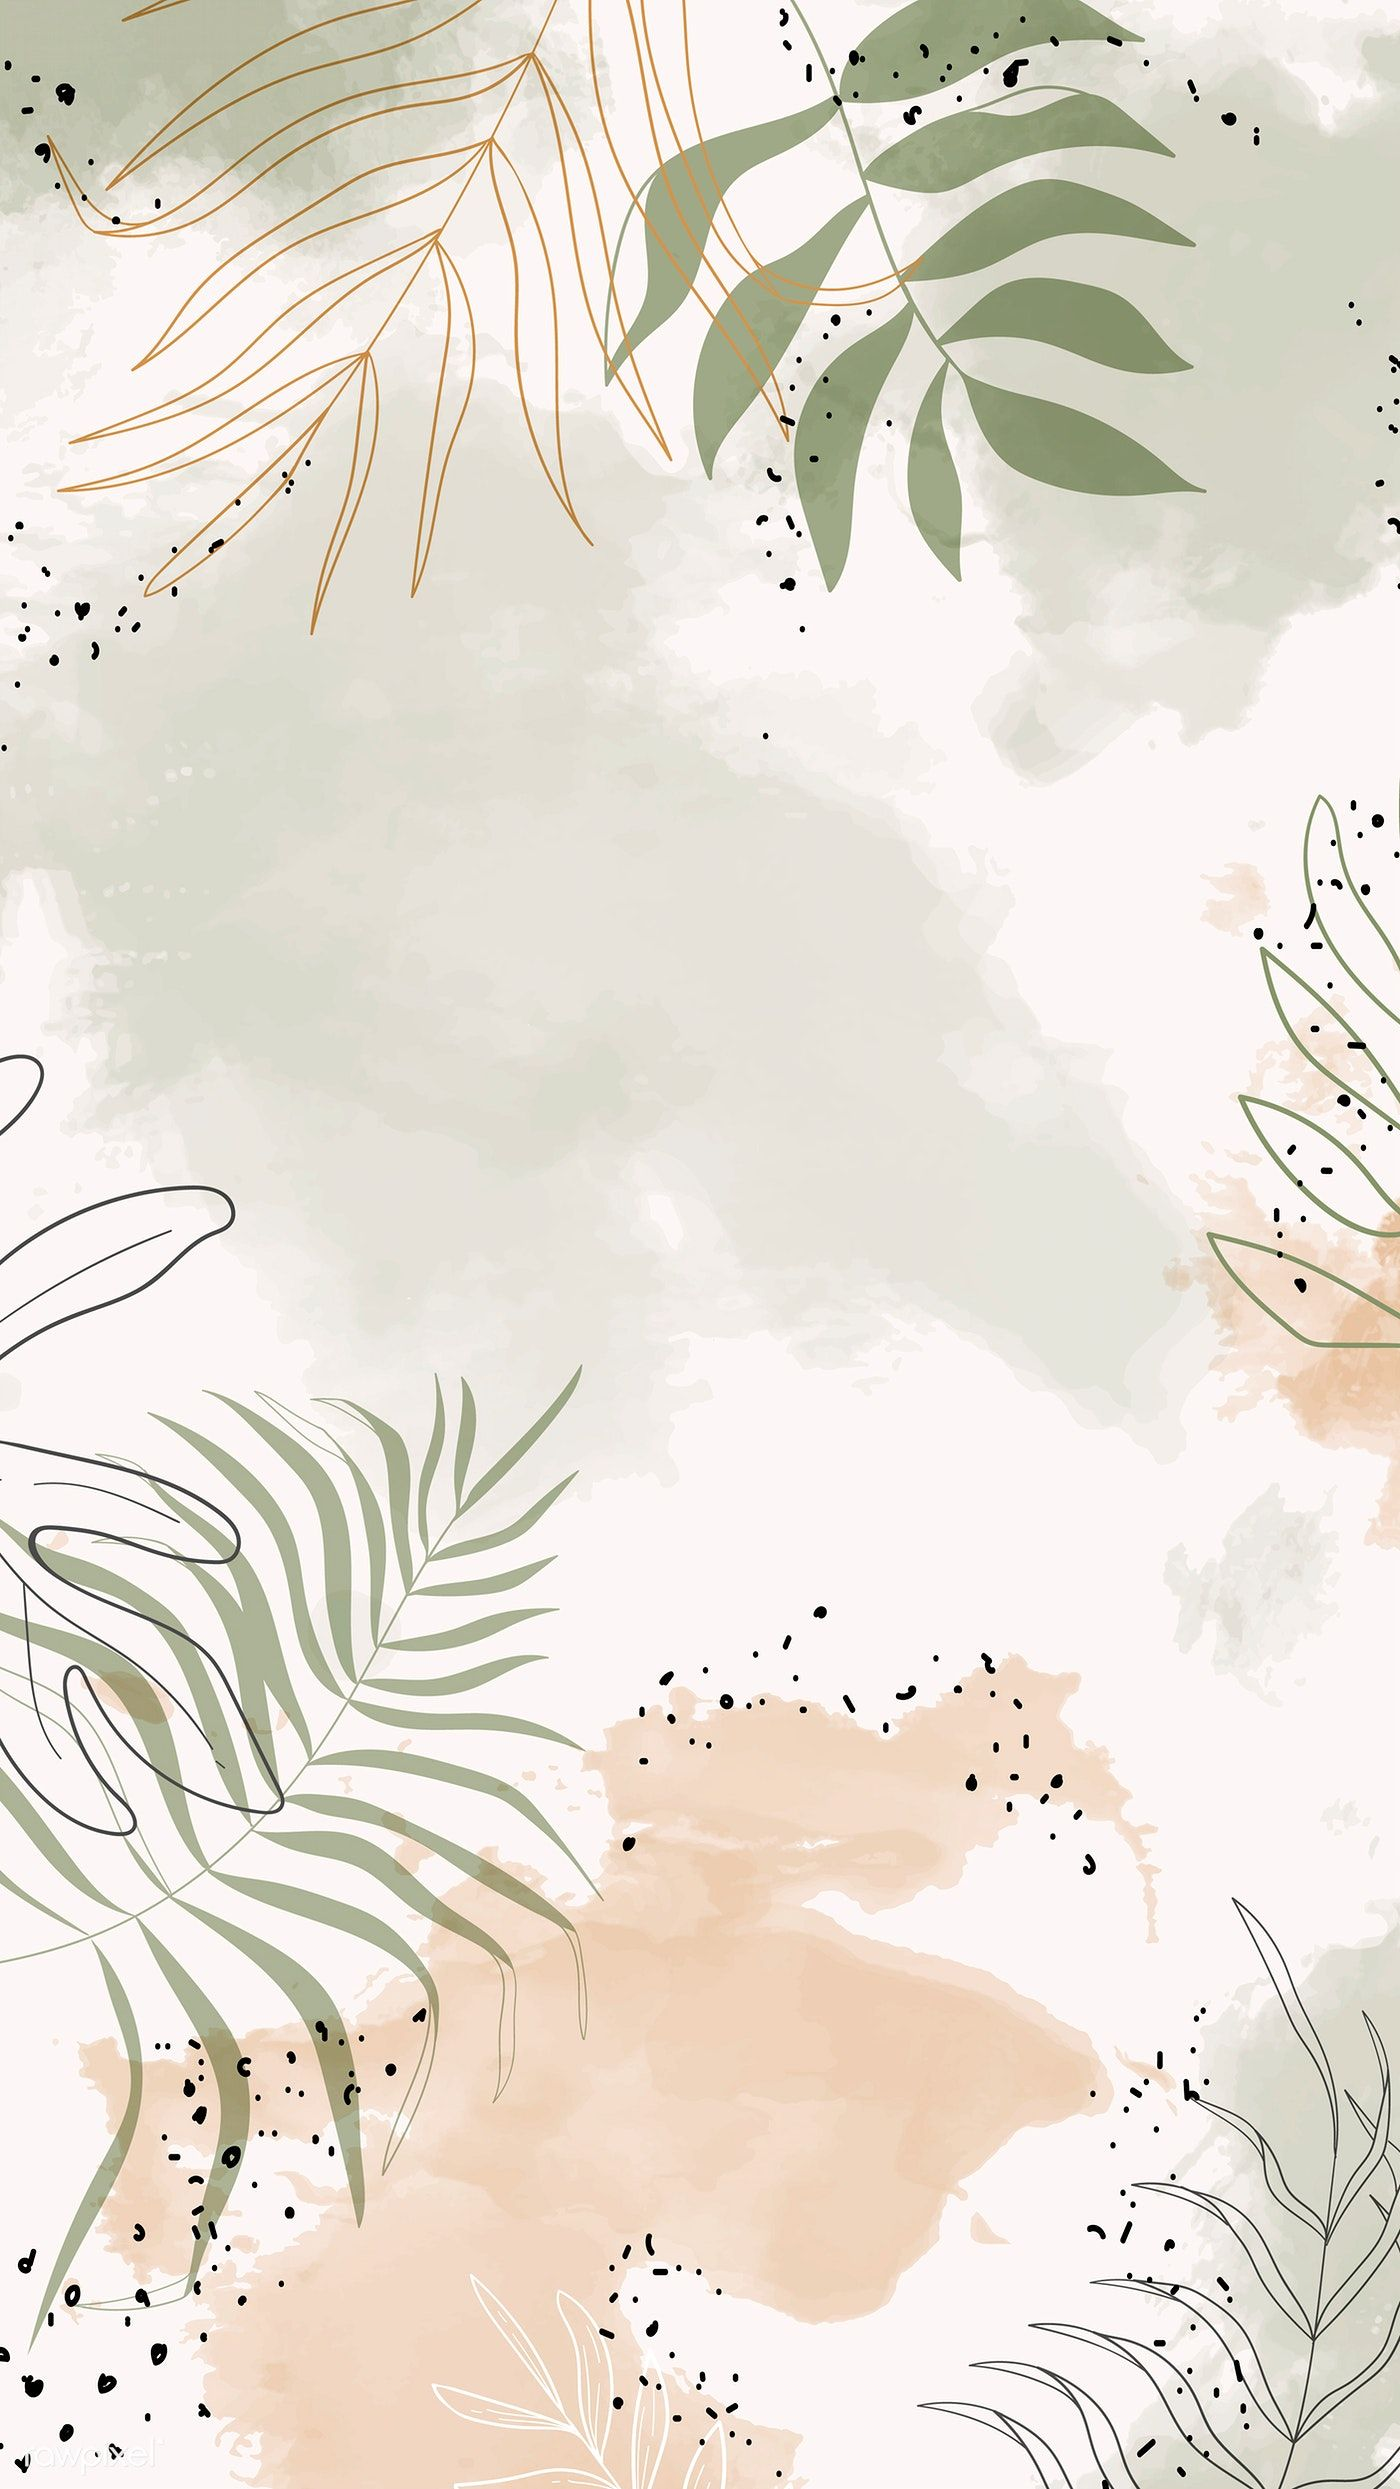 Download Premium Vector Of Beige Leafy Watercolor Mobile Phone Wallpaper Watercolor Wallpaper Iphone Watercolor Wallpaper Instagram Wallpaper